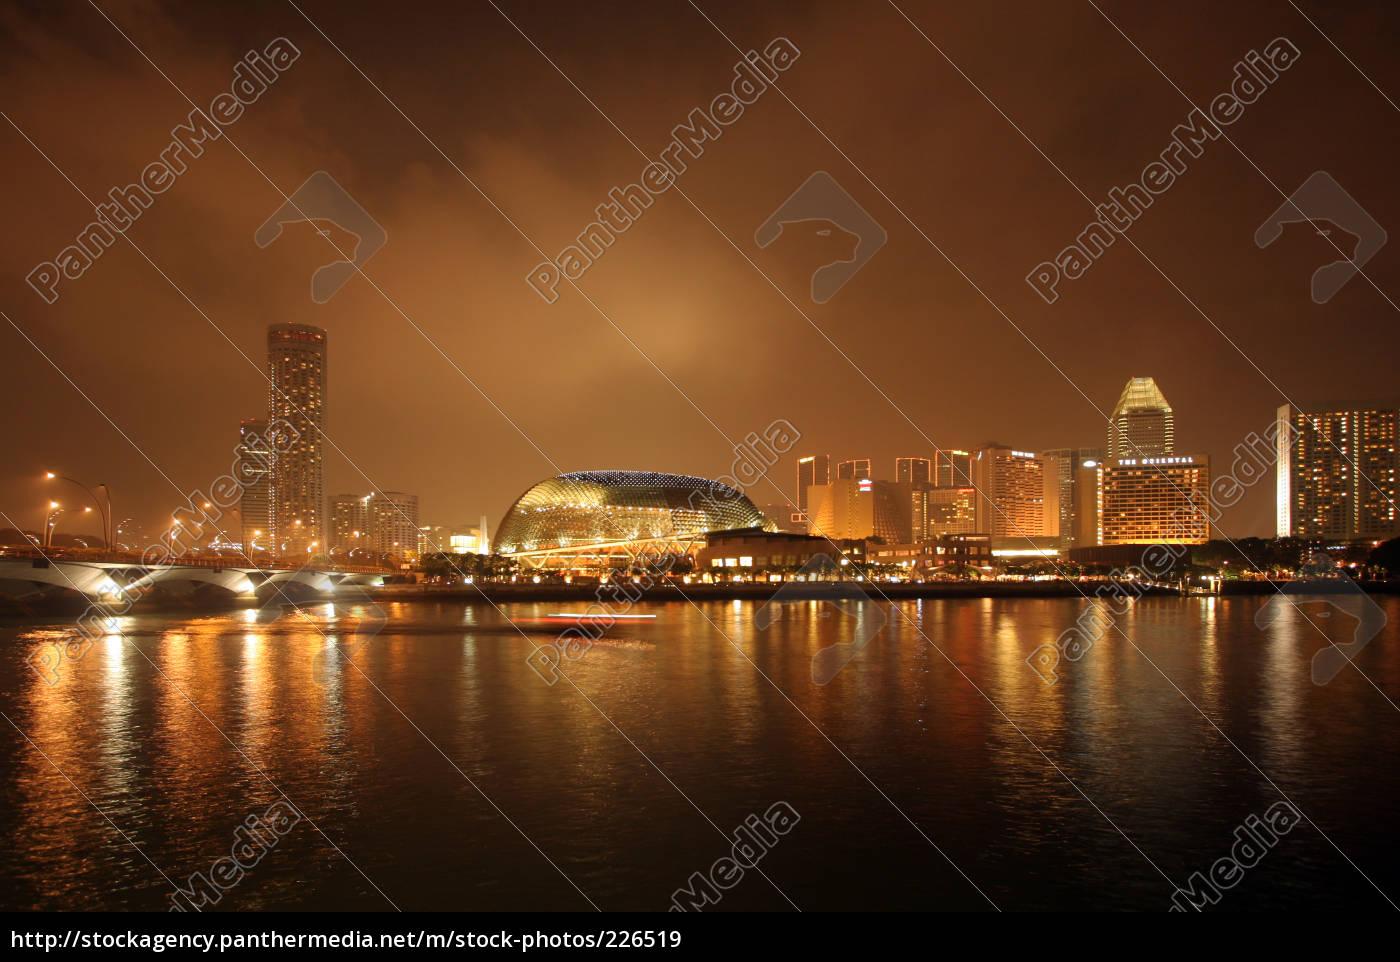 singapore, at, night - 226519